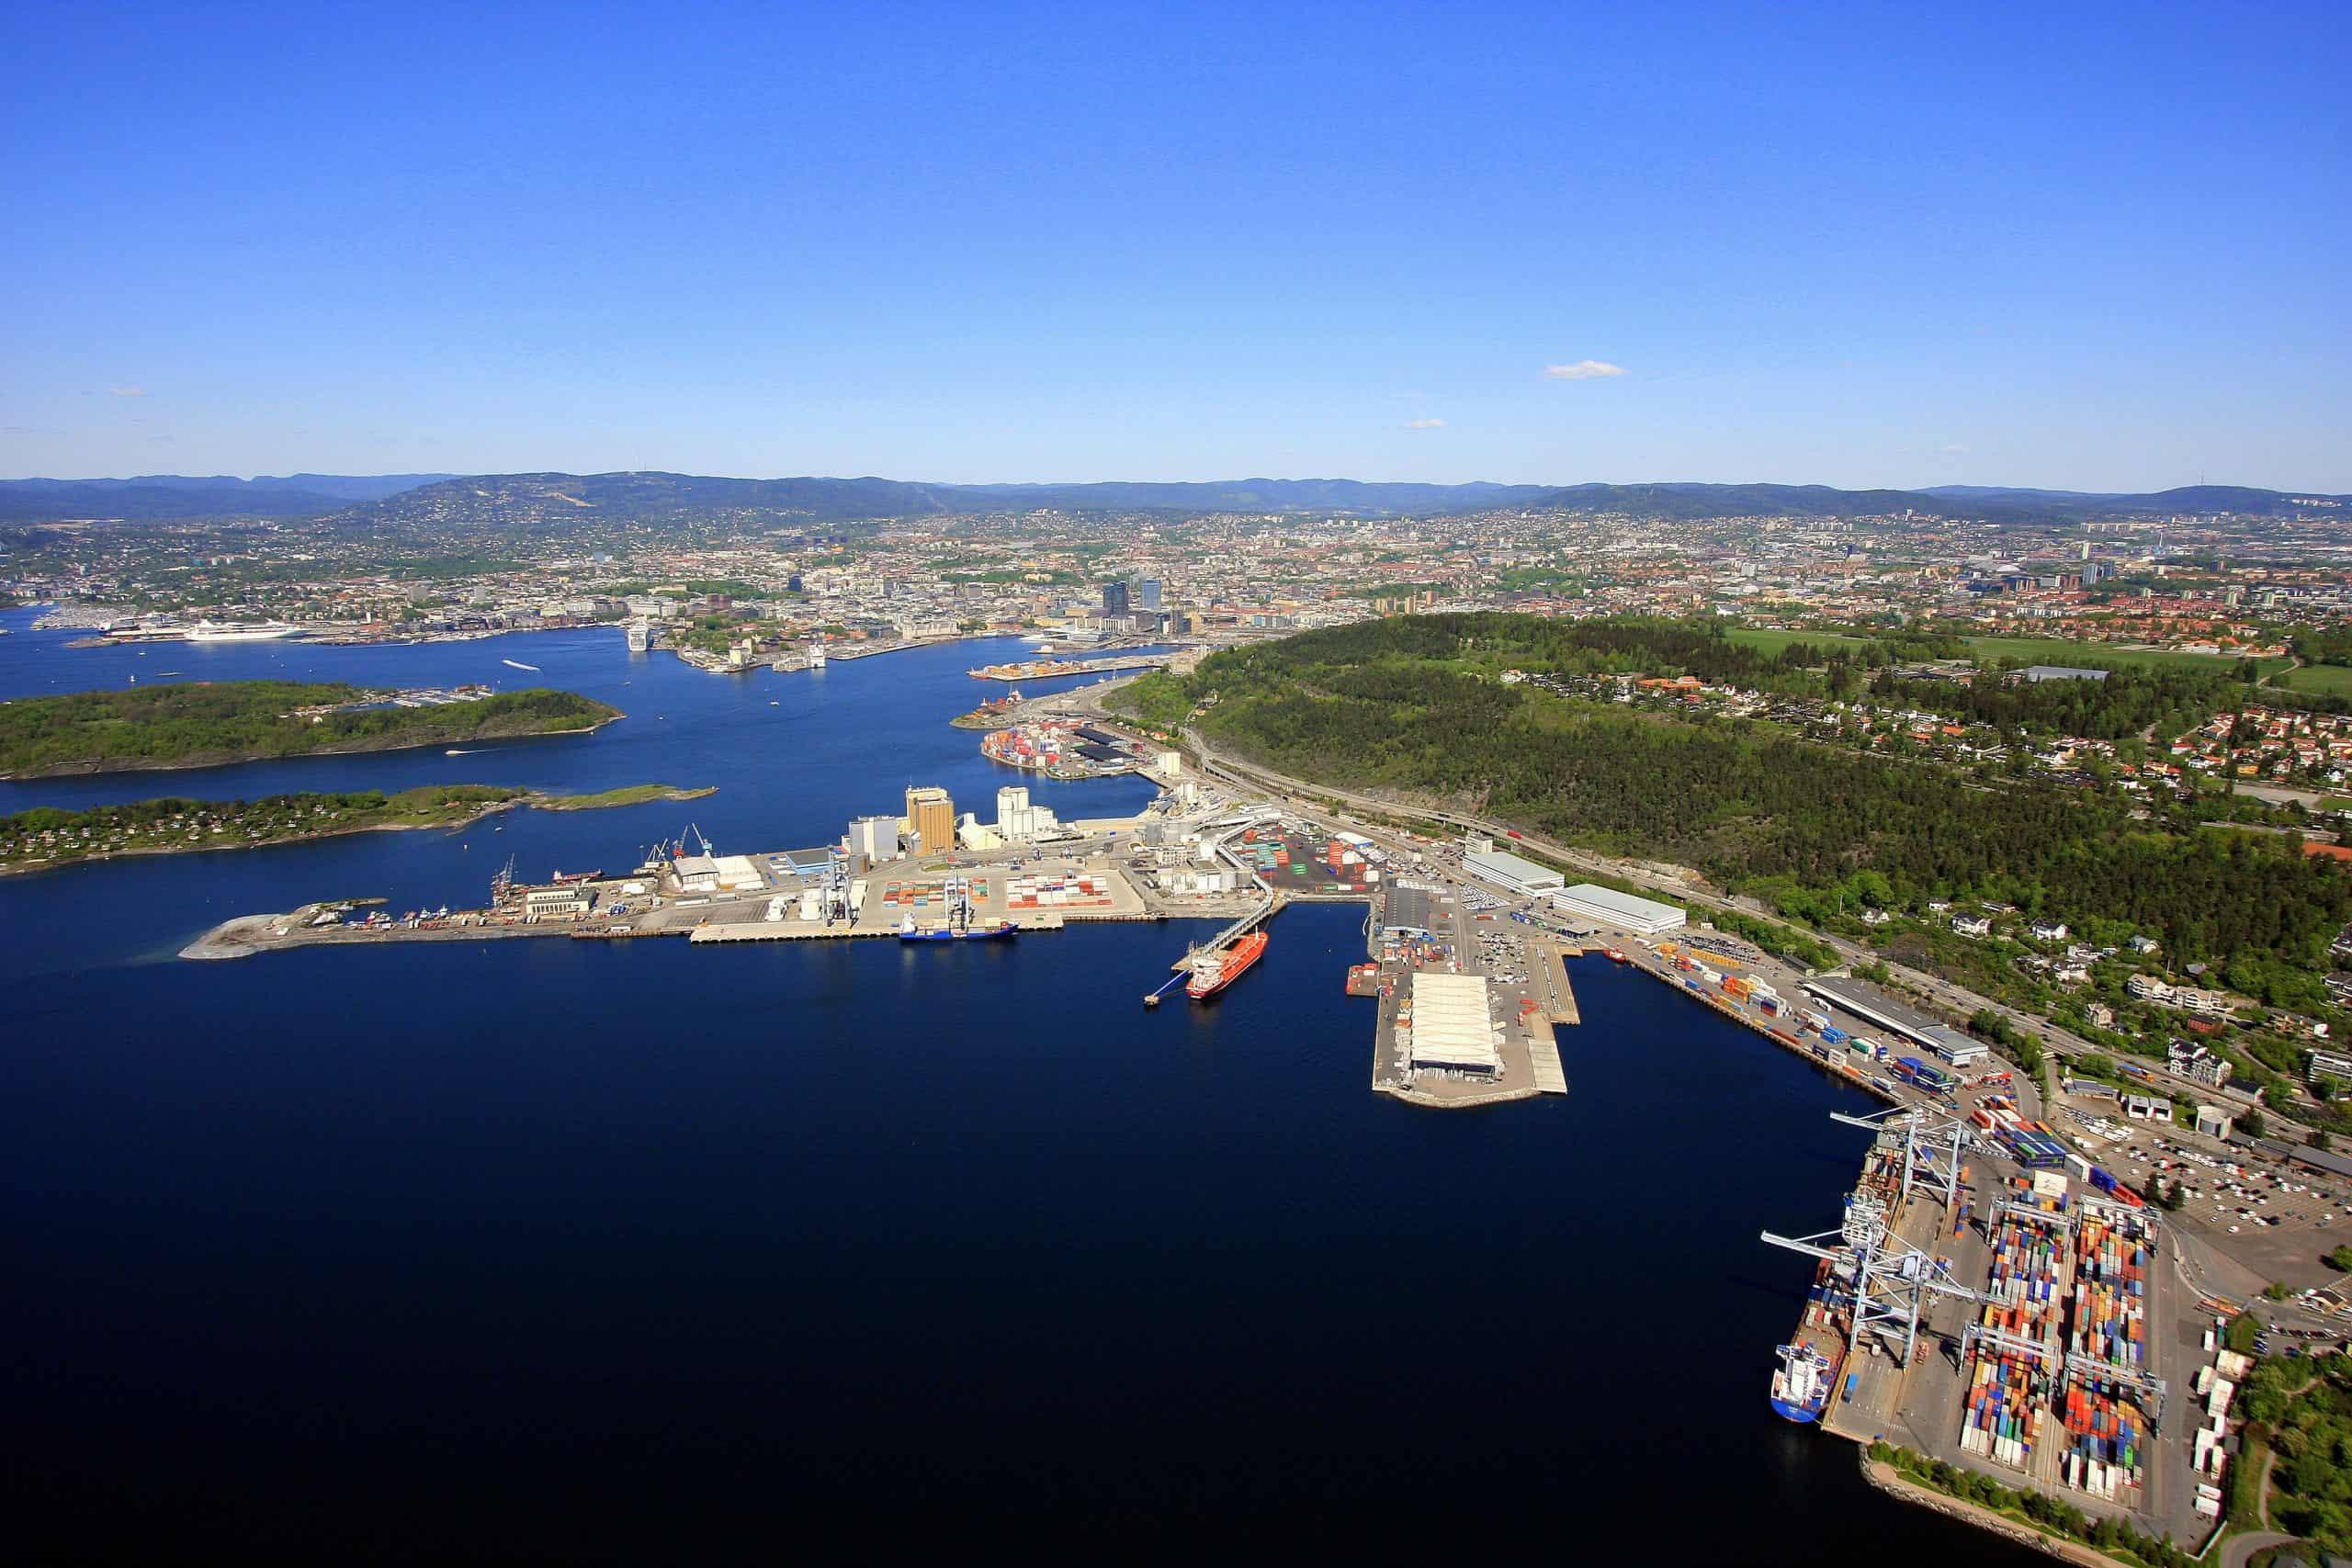 Oslo chooses Yilport as its terminal operator